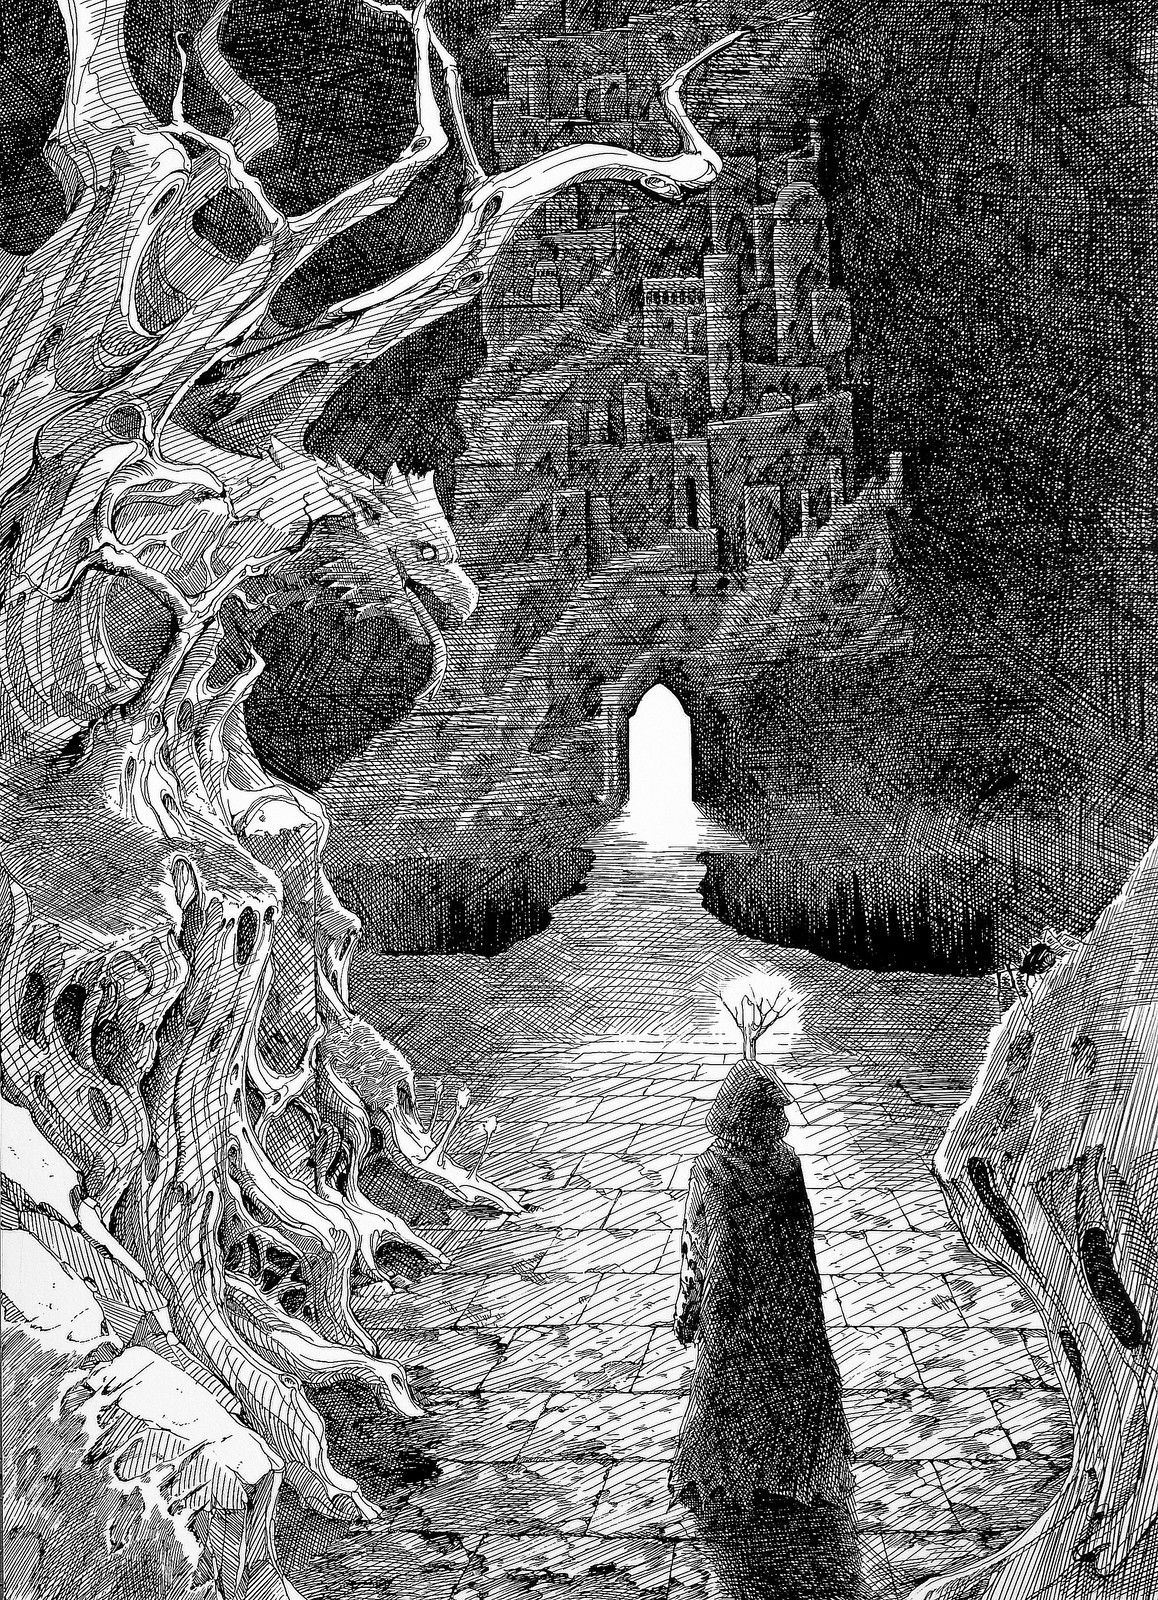 Lee Dabeen. Night Awakened. 2018. Pen on paper, 545 x 394 mm.